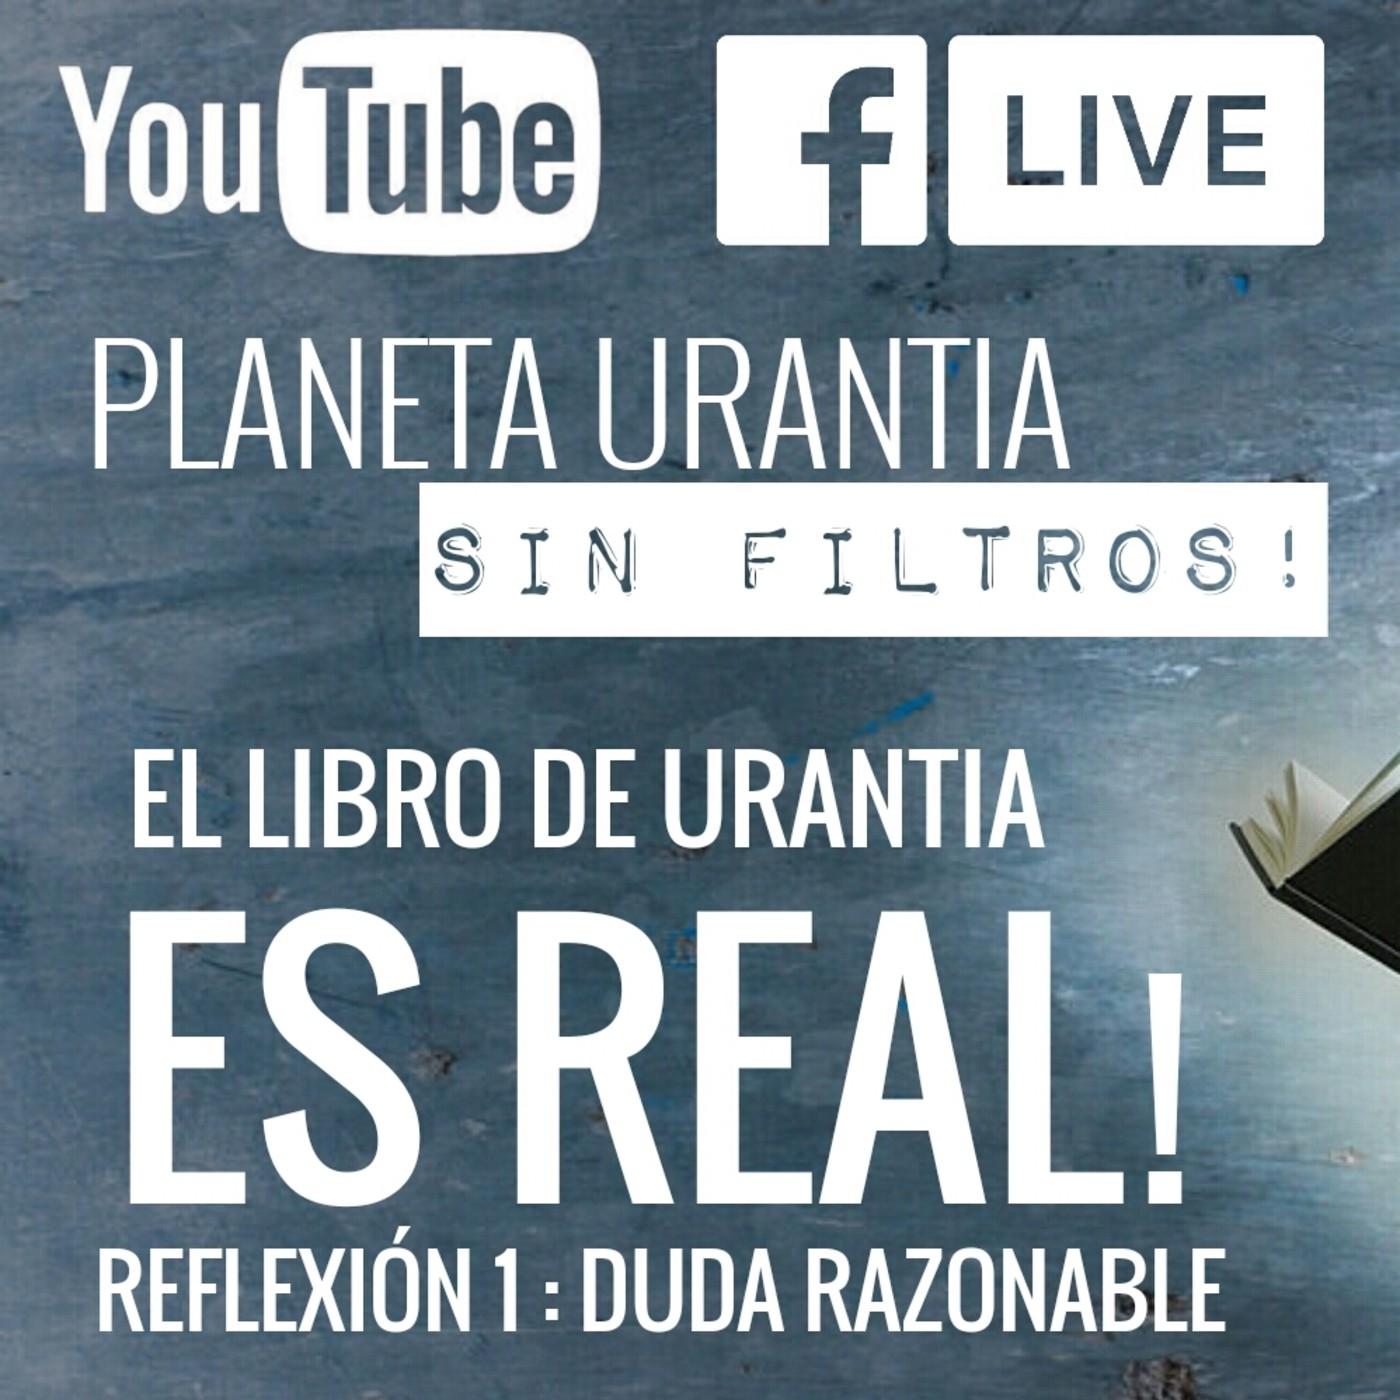 Planeta Urantia Sinfiltros Reflexion 1 Duda Razonable En Podcast